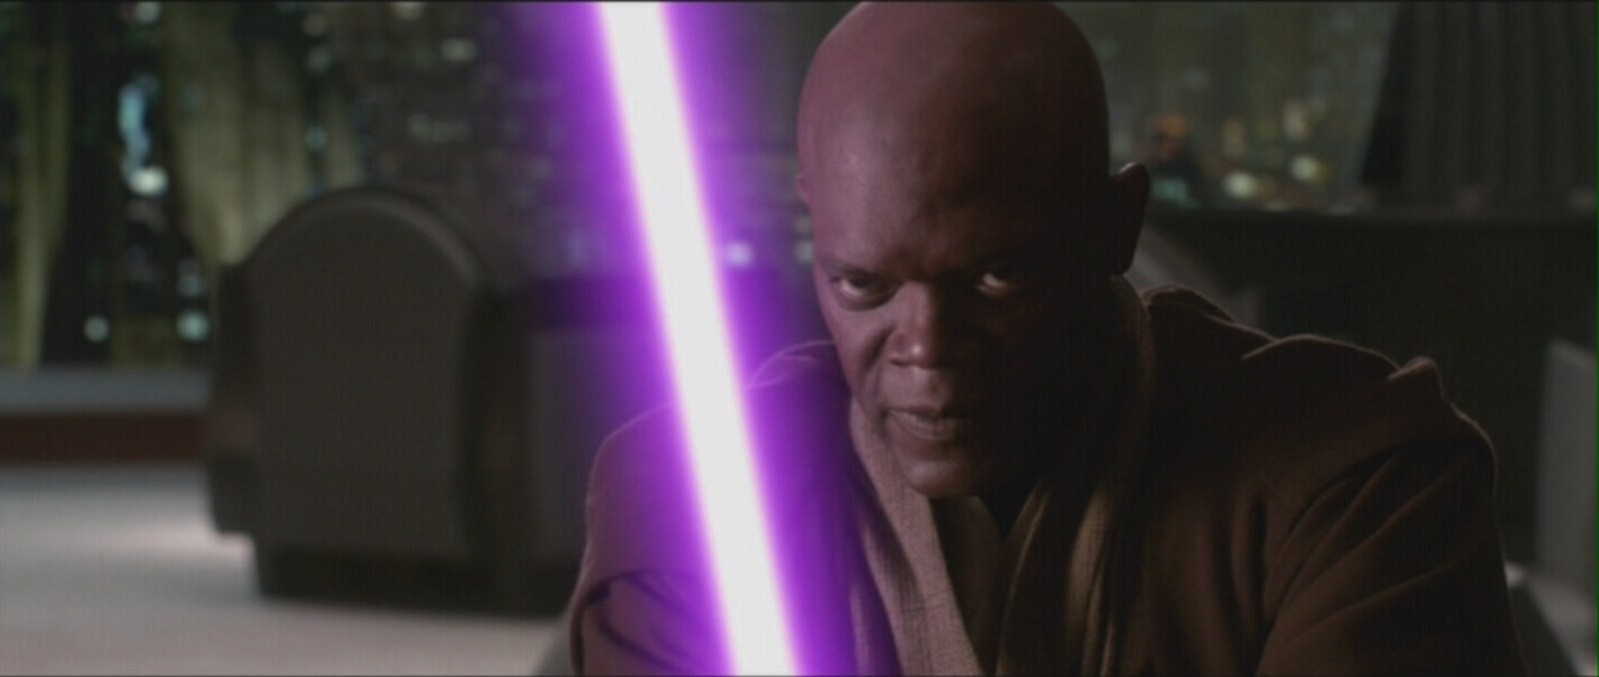 Etoile Star Wars Revenge Of The Sith Mace Windu Image 12176780 Fanpop